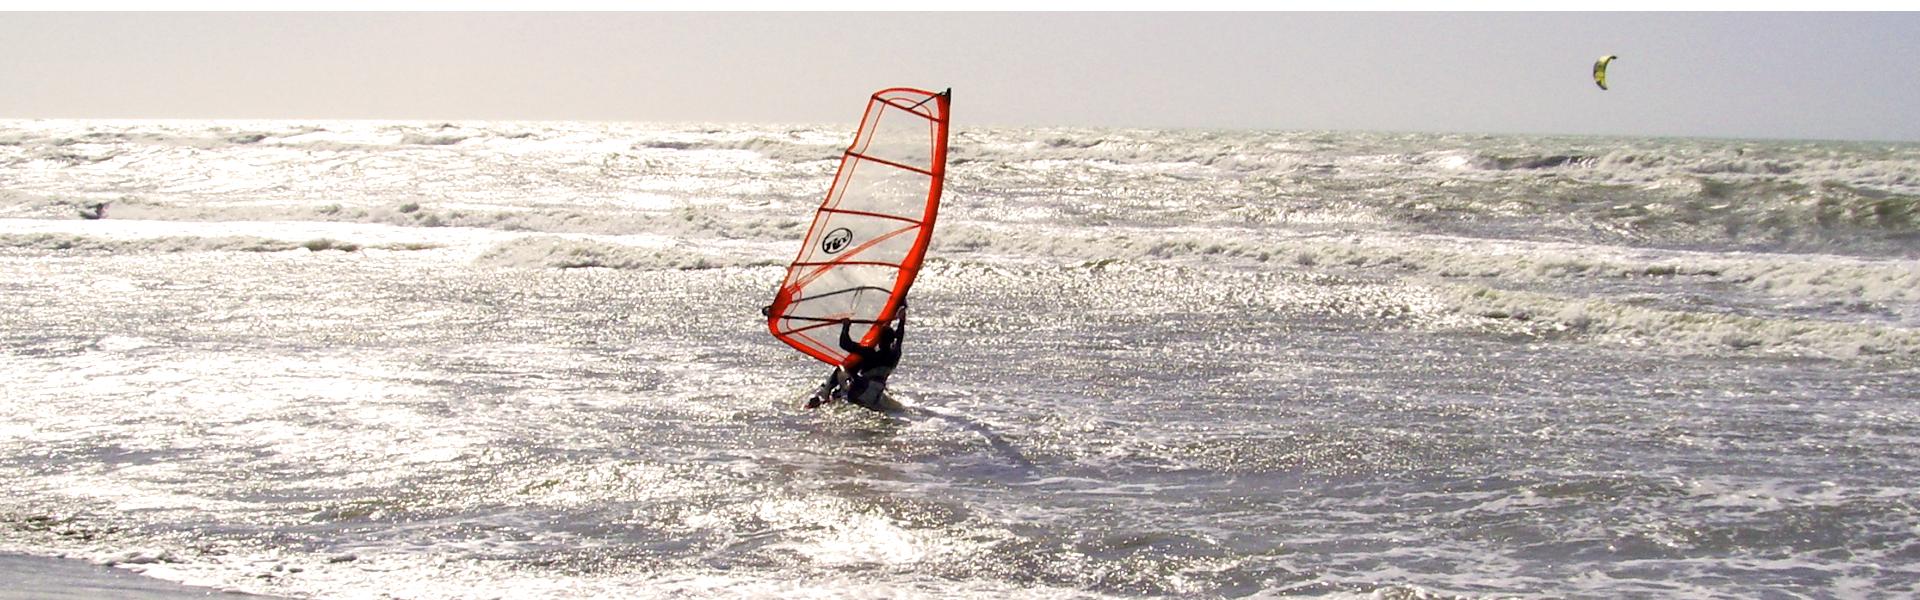 surf-marinaok